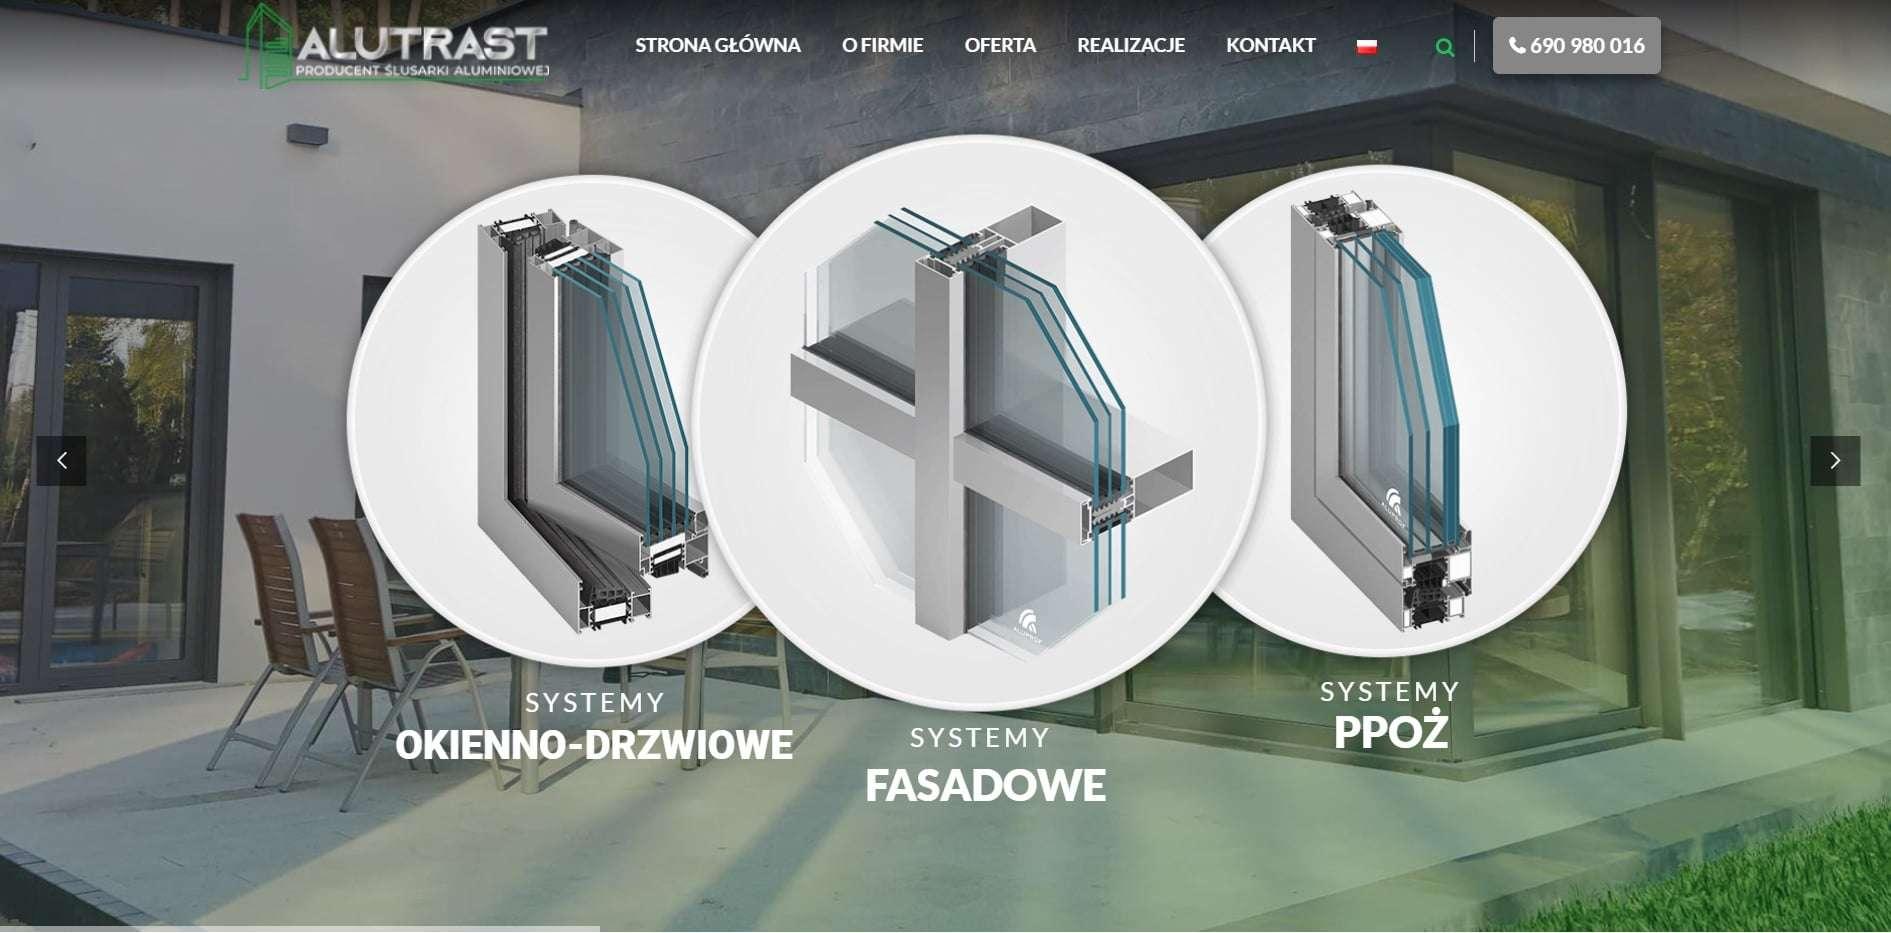 Alutrast.pl